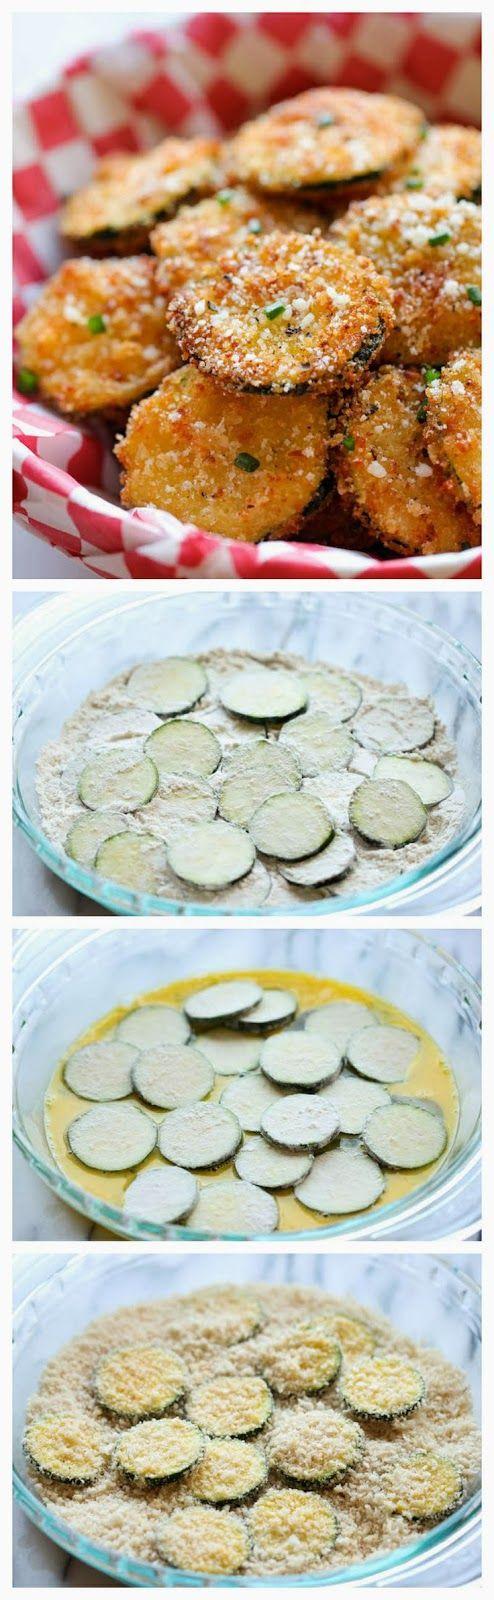 Zucchini Parmesan Crisps | The Best Healthy Recipes